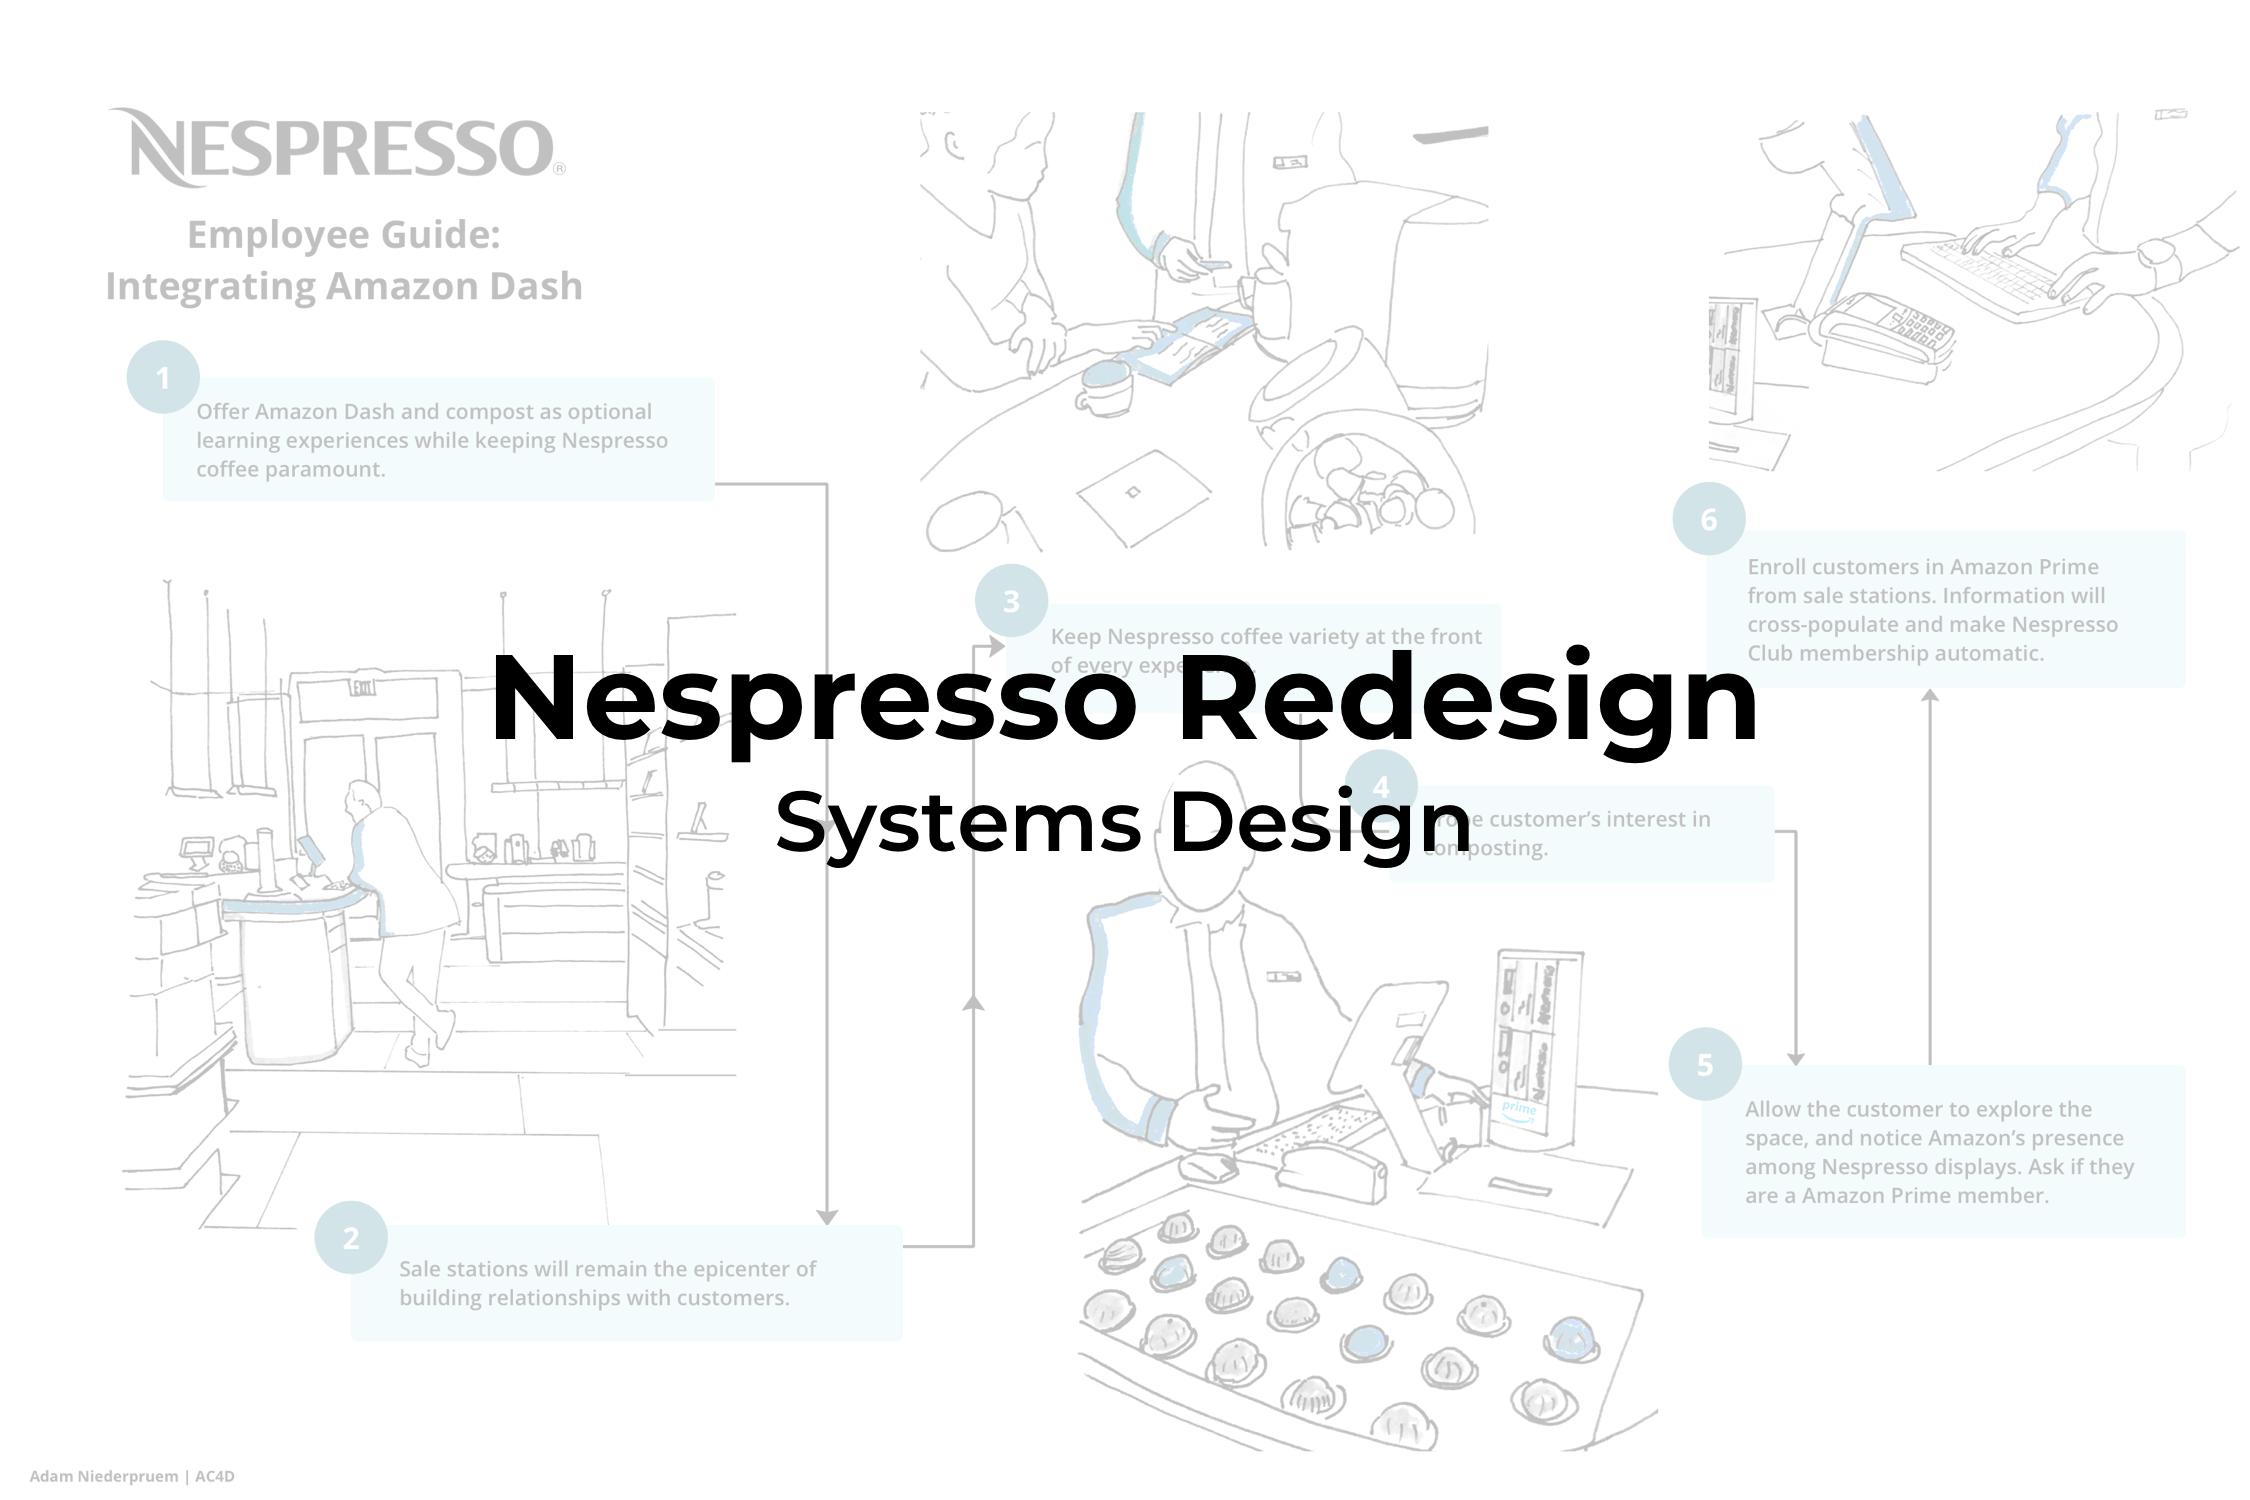 Nespresso_w_title.png